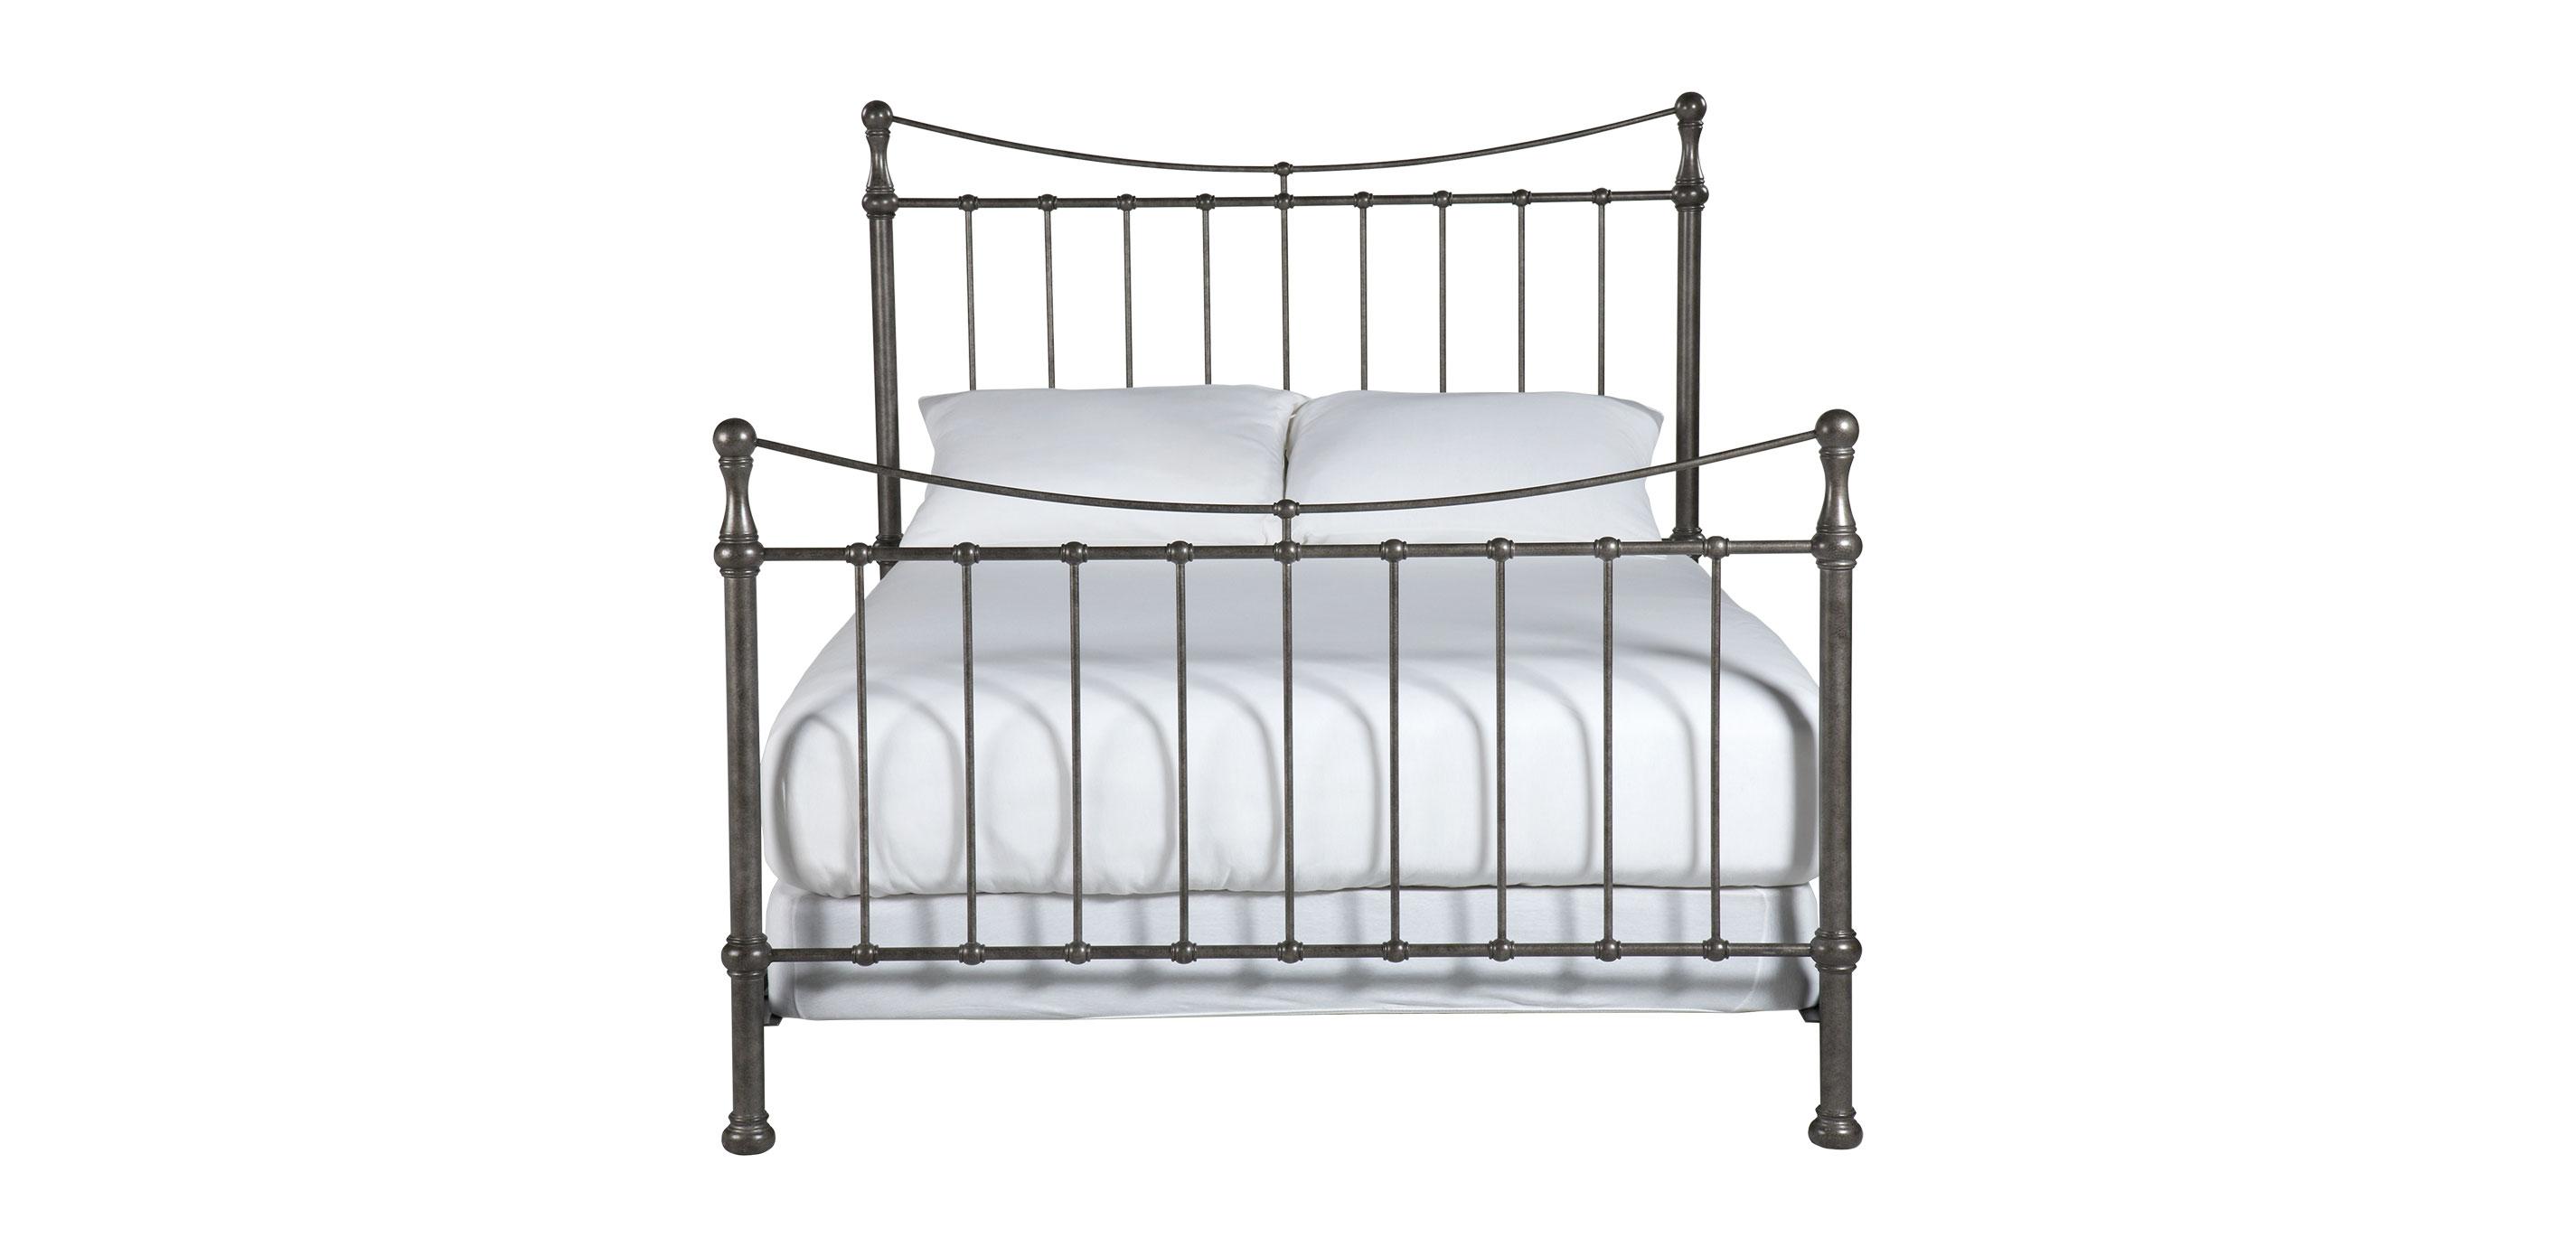 with footboard allen shop us beds high bedroom front ethan nn ethanallen s headboard furniture quinn en gray bed large